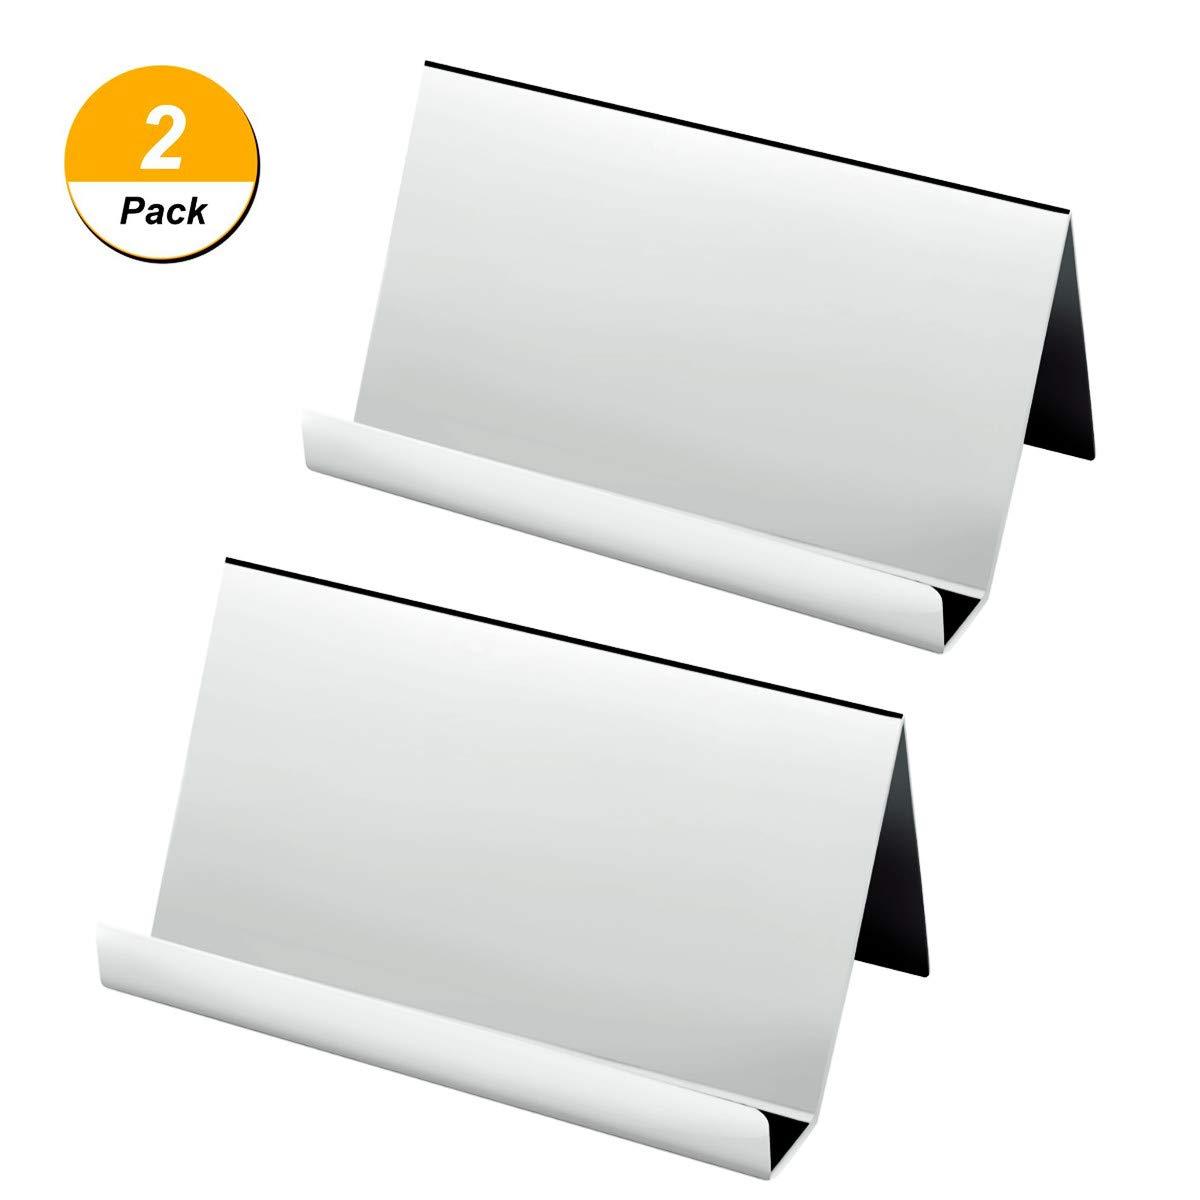 Amazon 2 Packs Business Card Holders Nipole Desktop Business